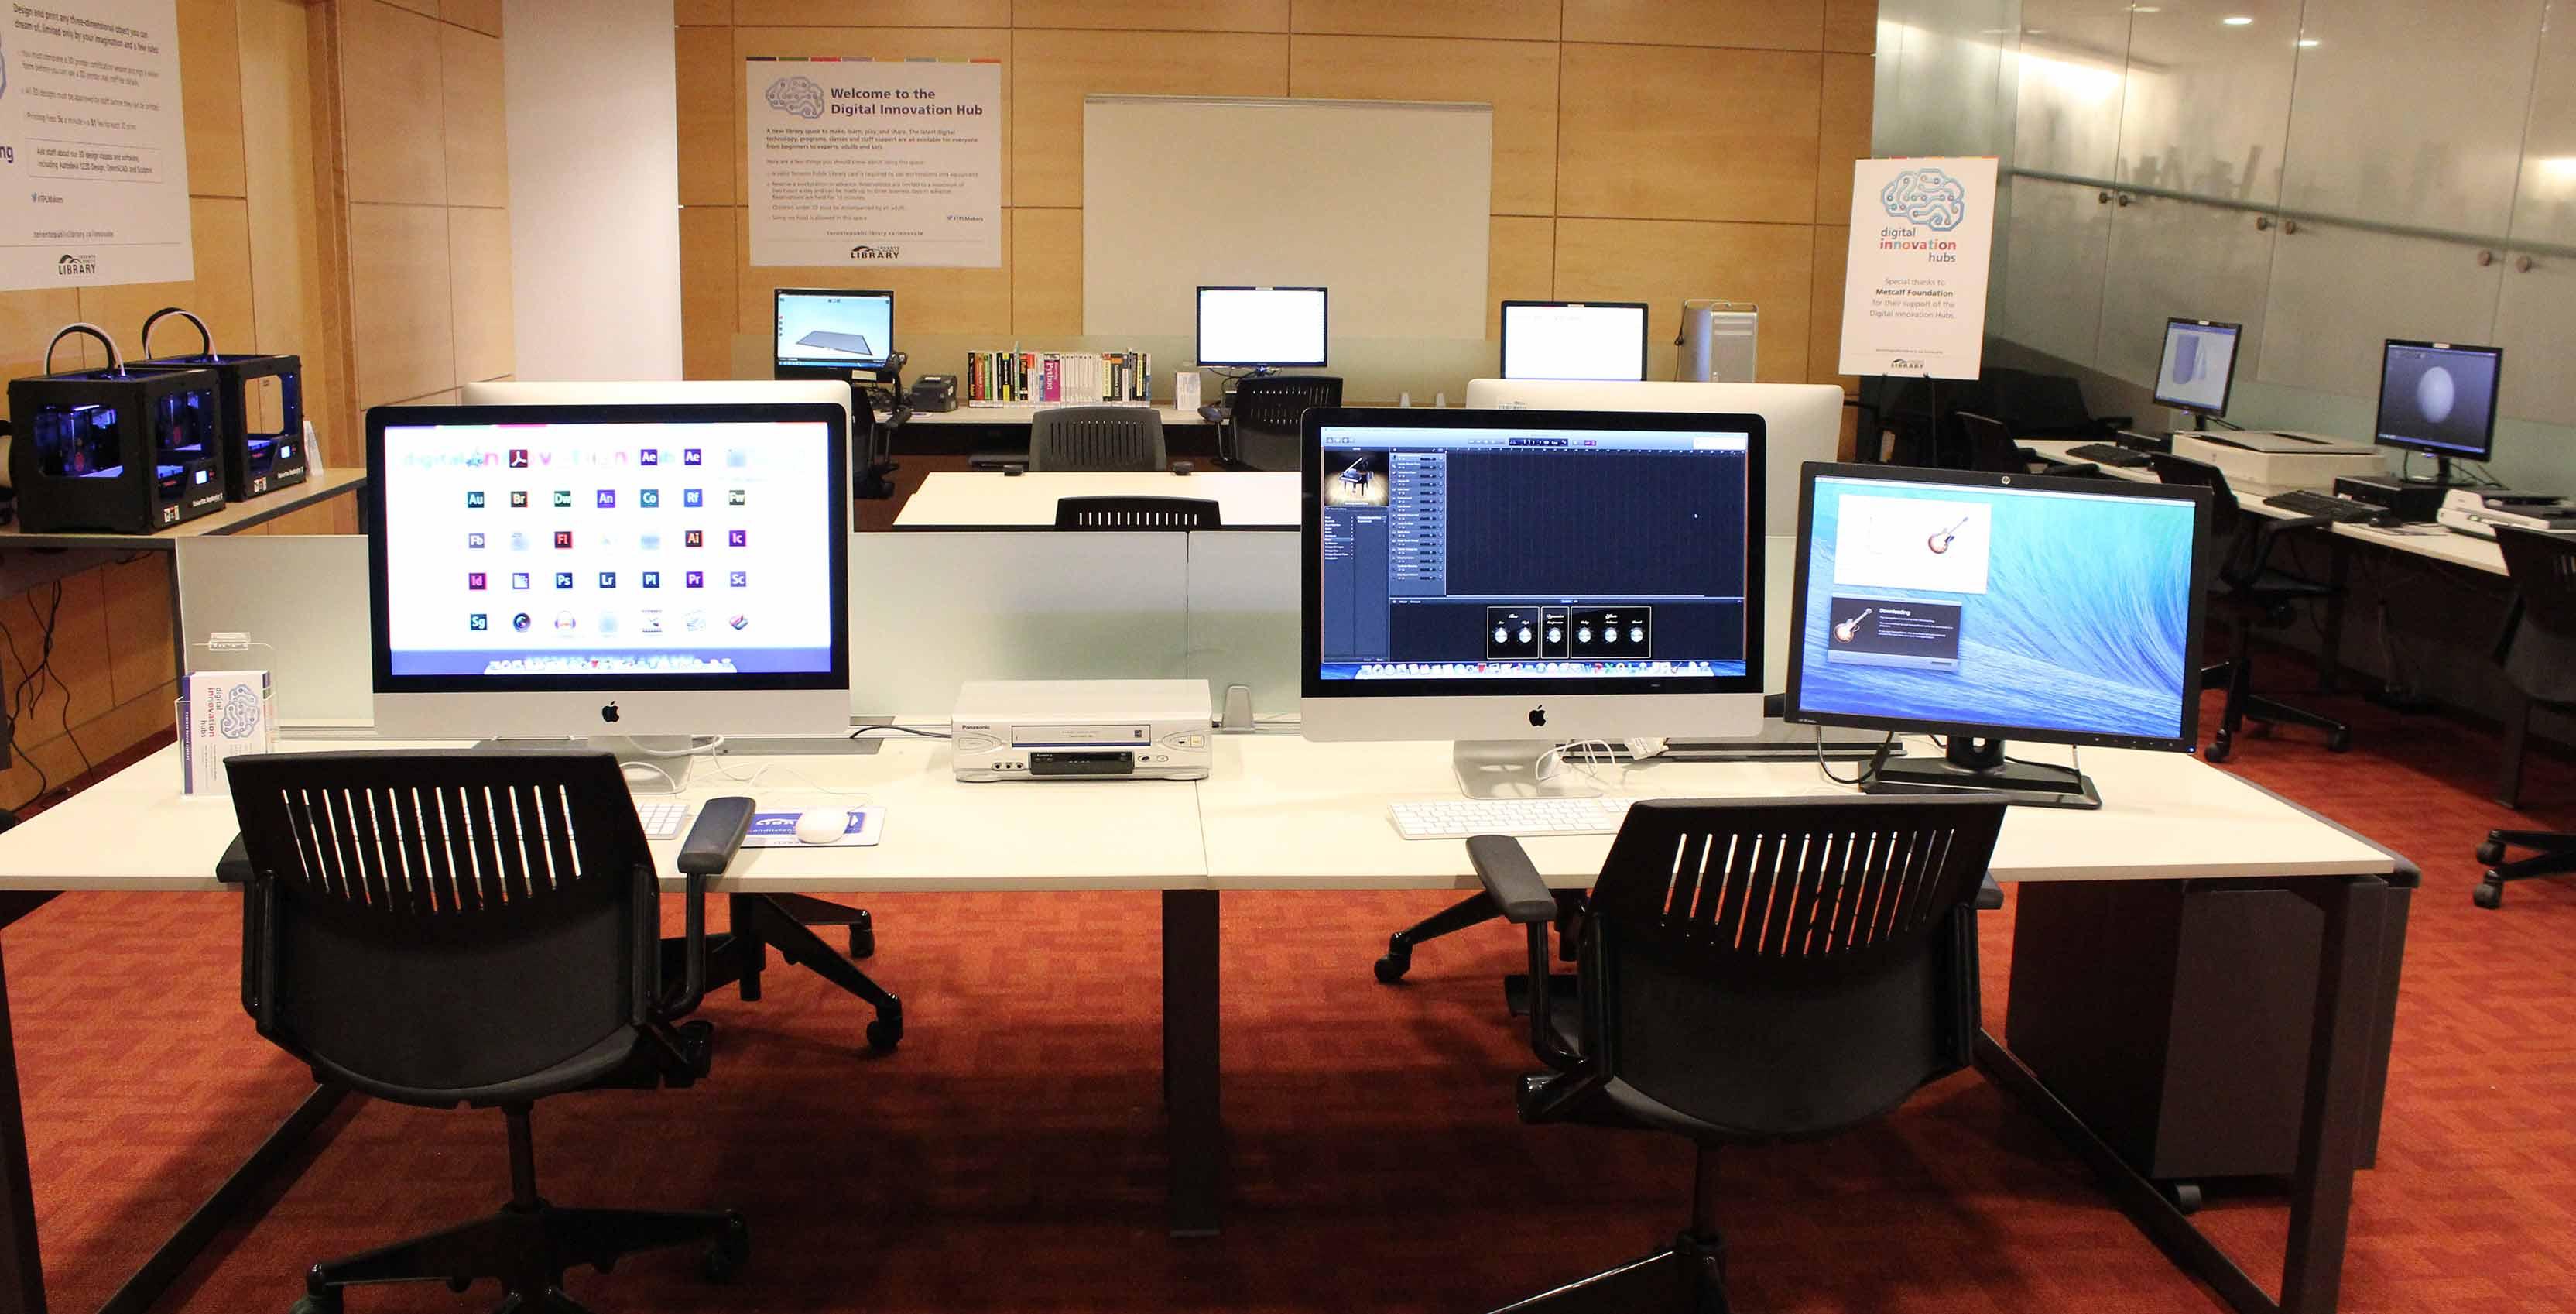 Digital Innovation Hub's Macs at the Toronto Public Library